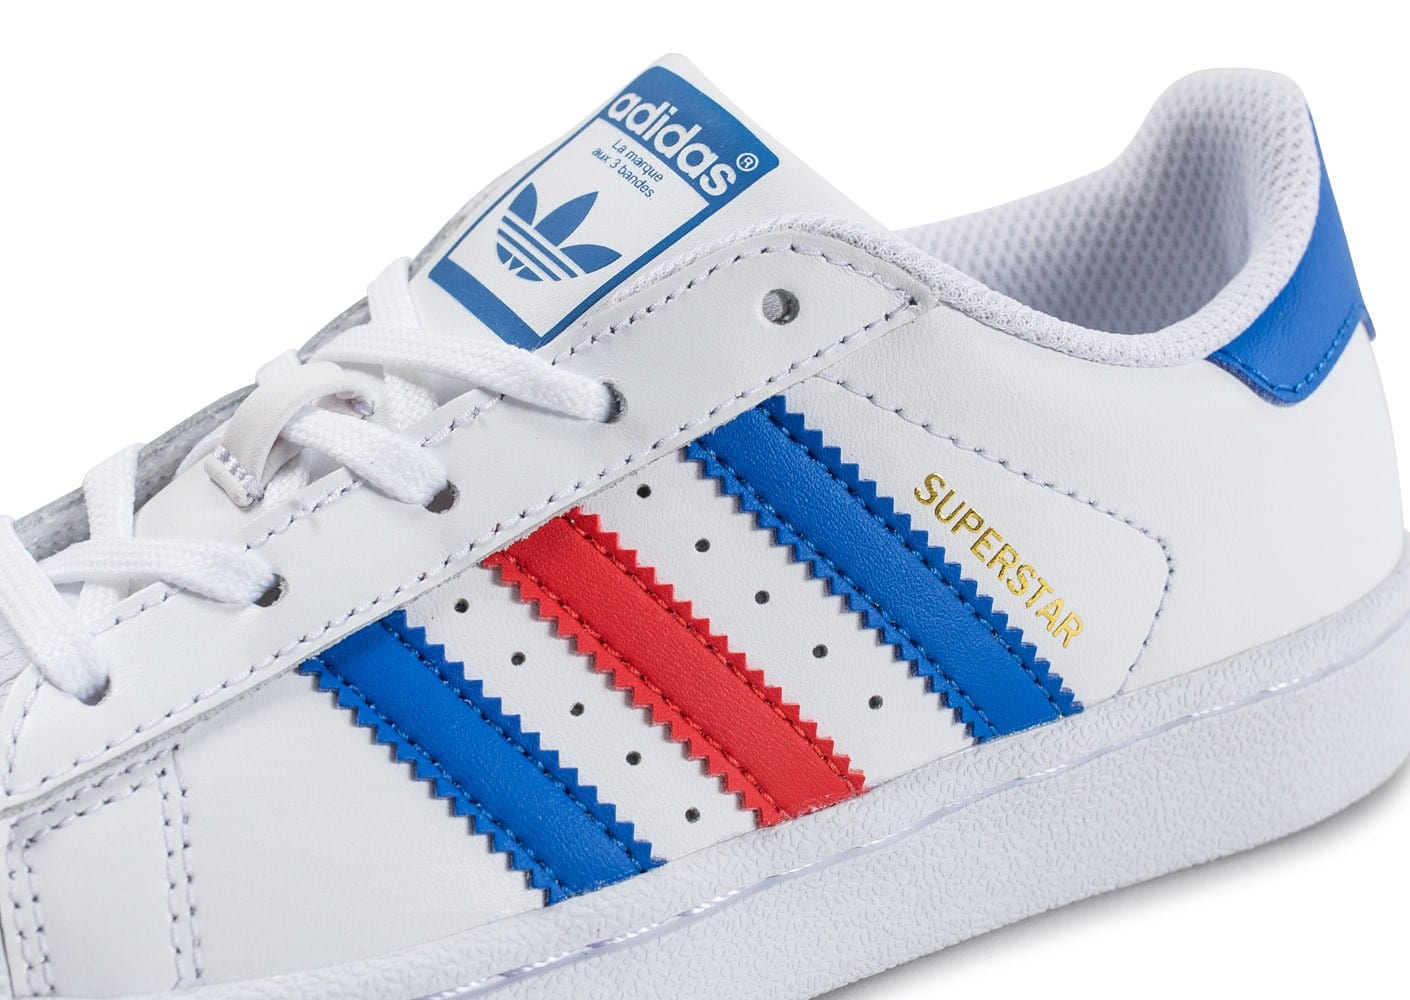 Ligne Rouge Chaussure Bleu Blanc Avis Adidas 5a4lrj En n8wOPXkN0